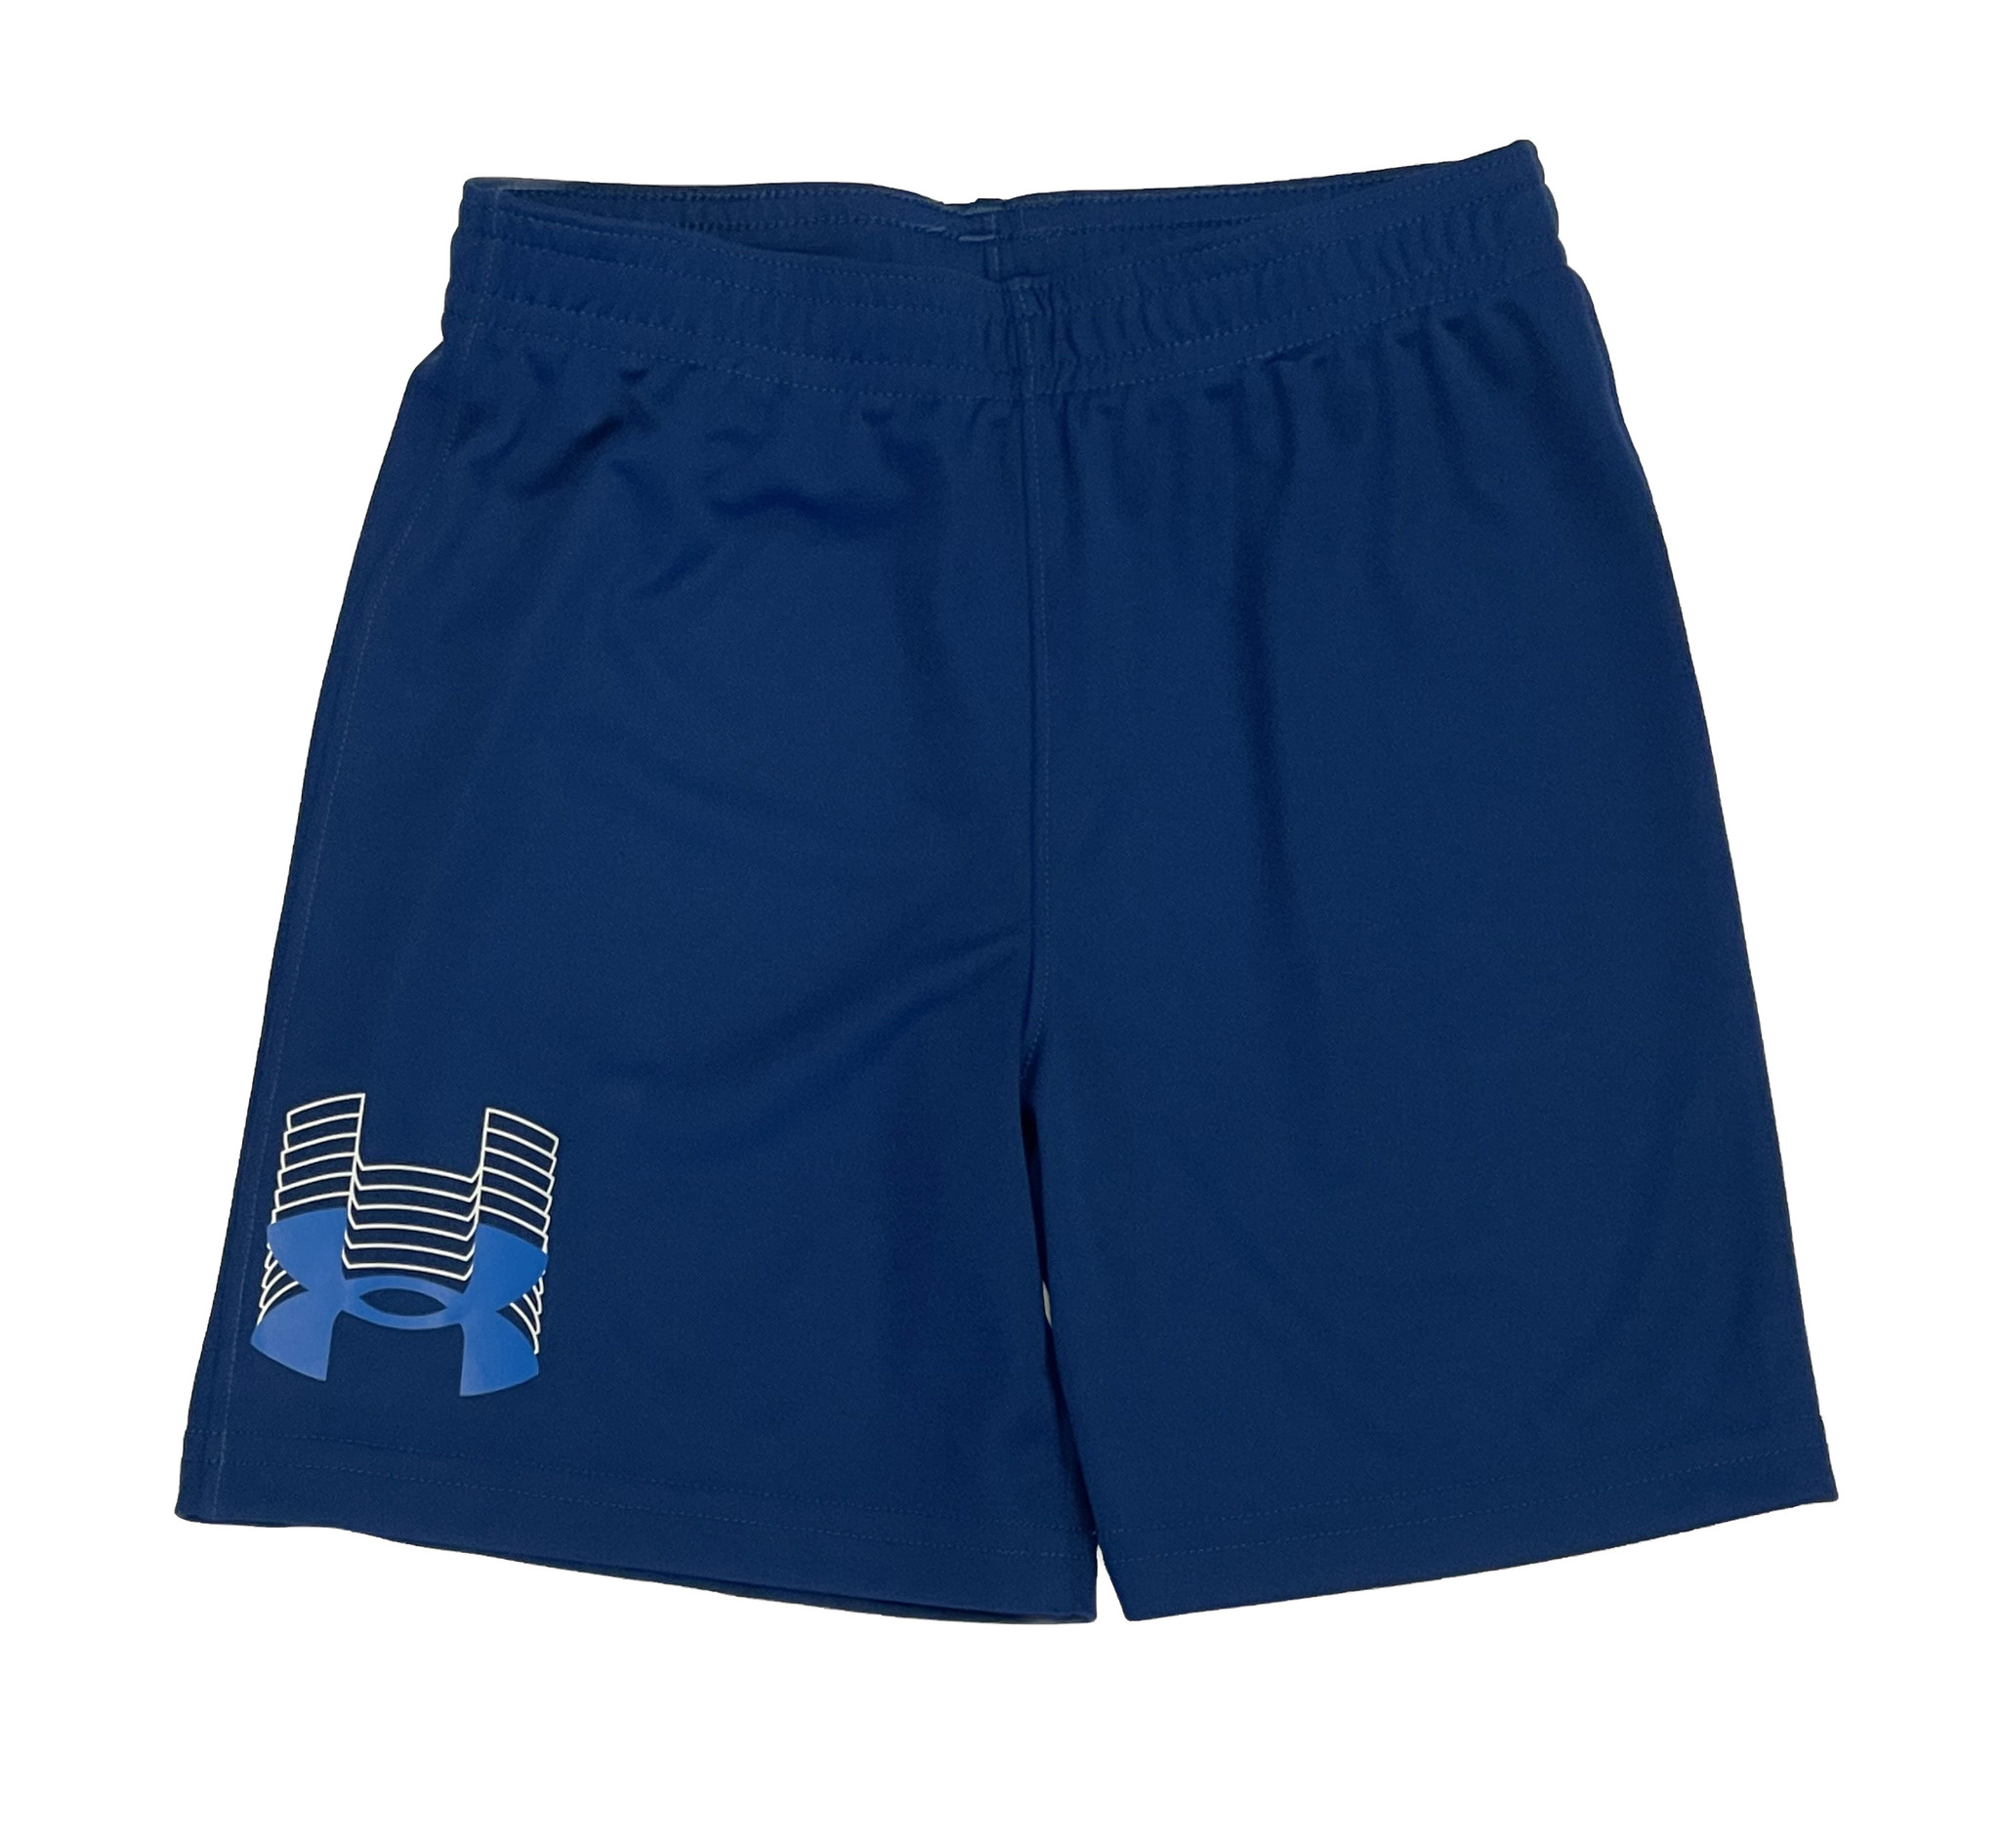 Under Armour Graphite Blue Logo Shorts